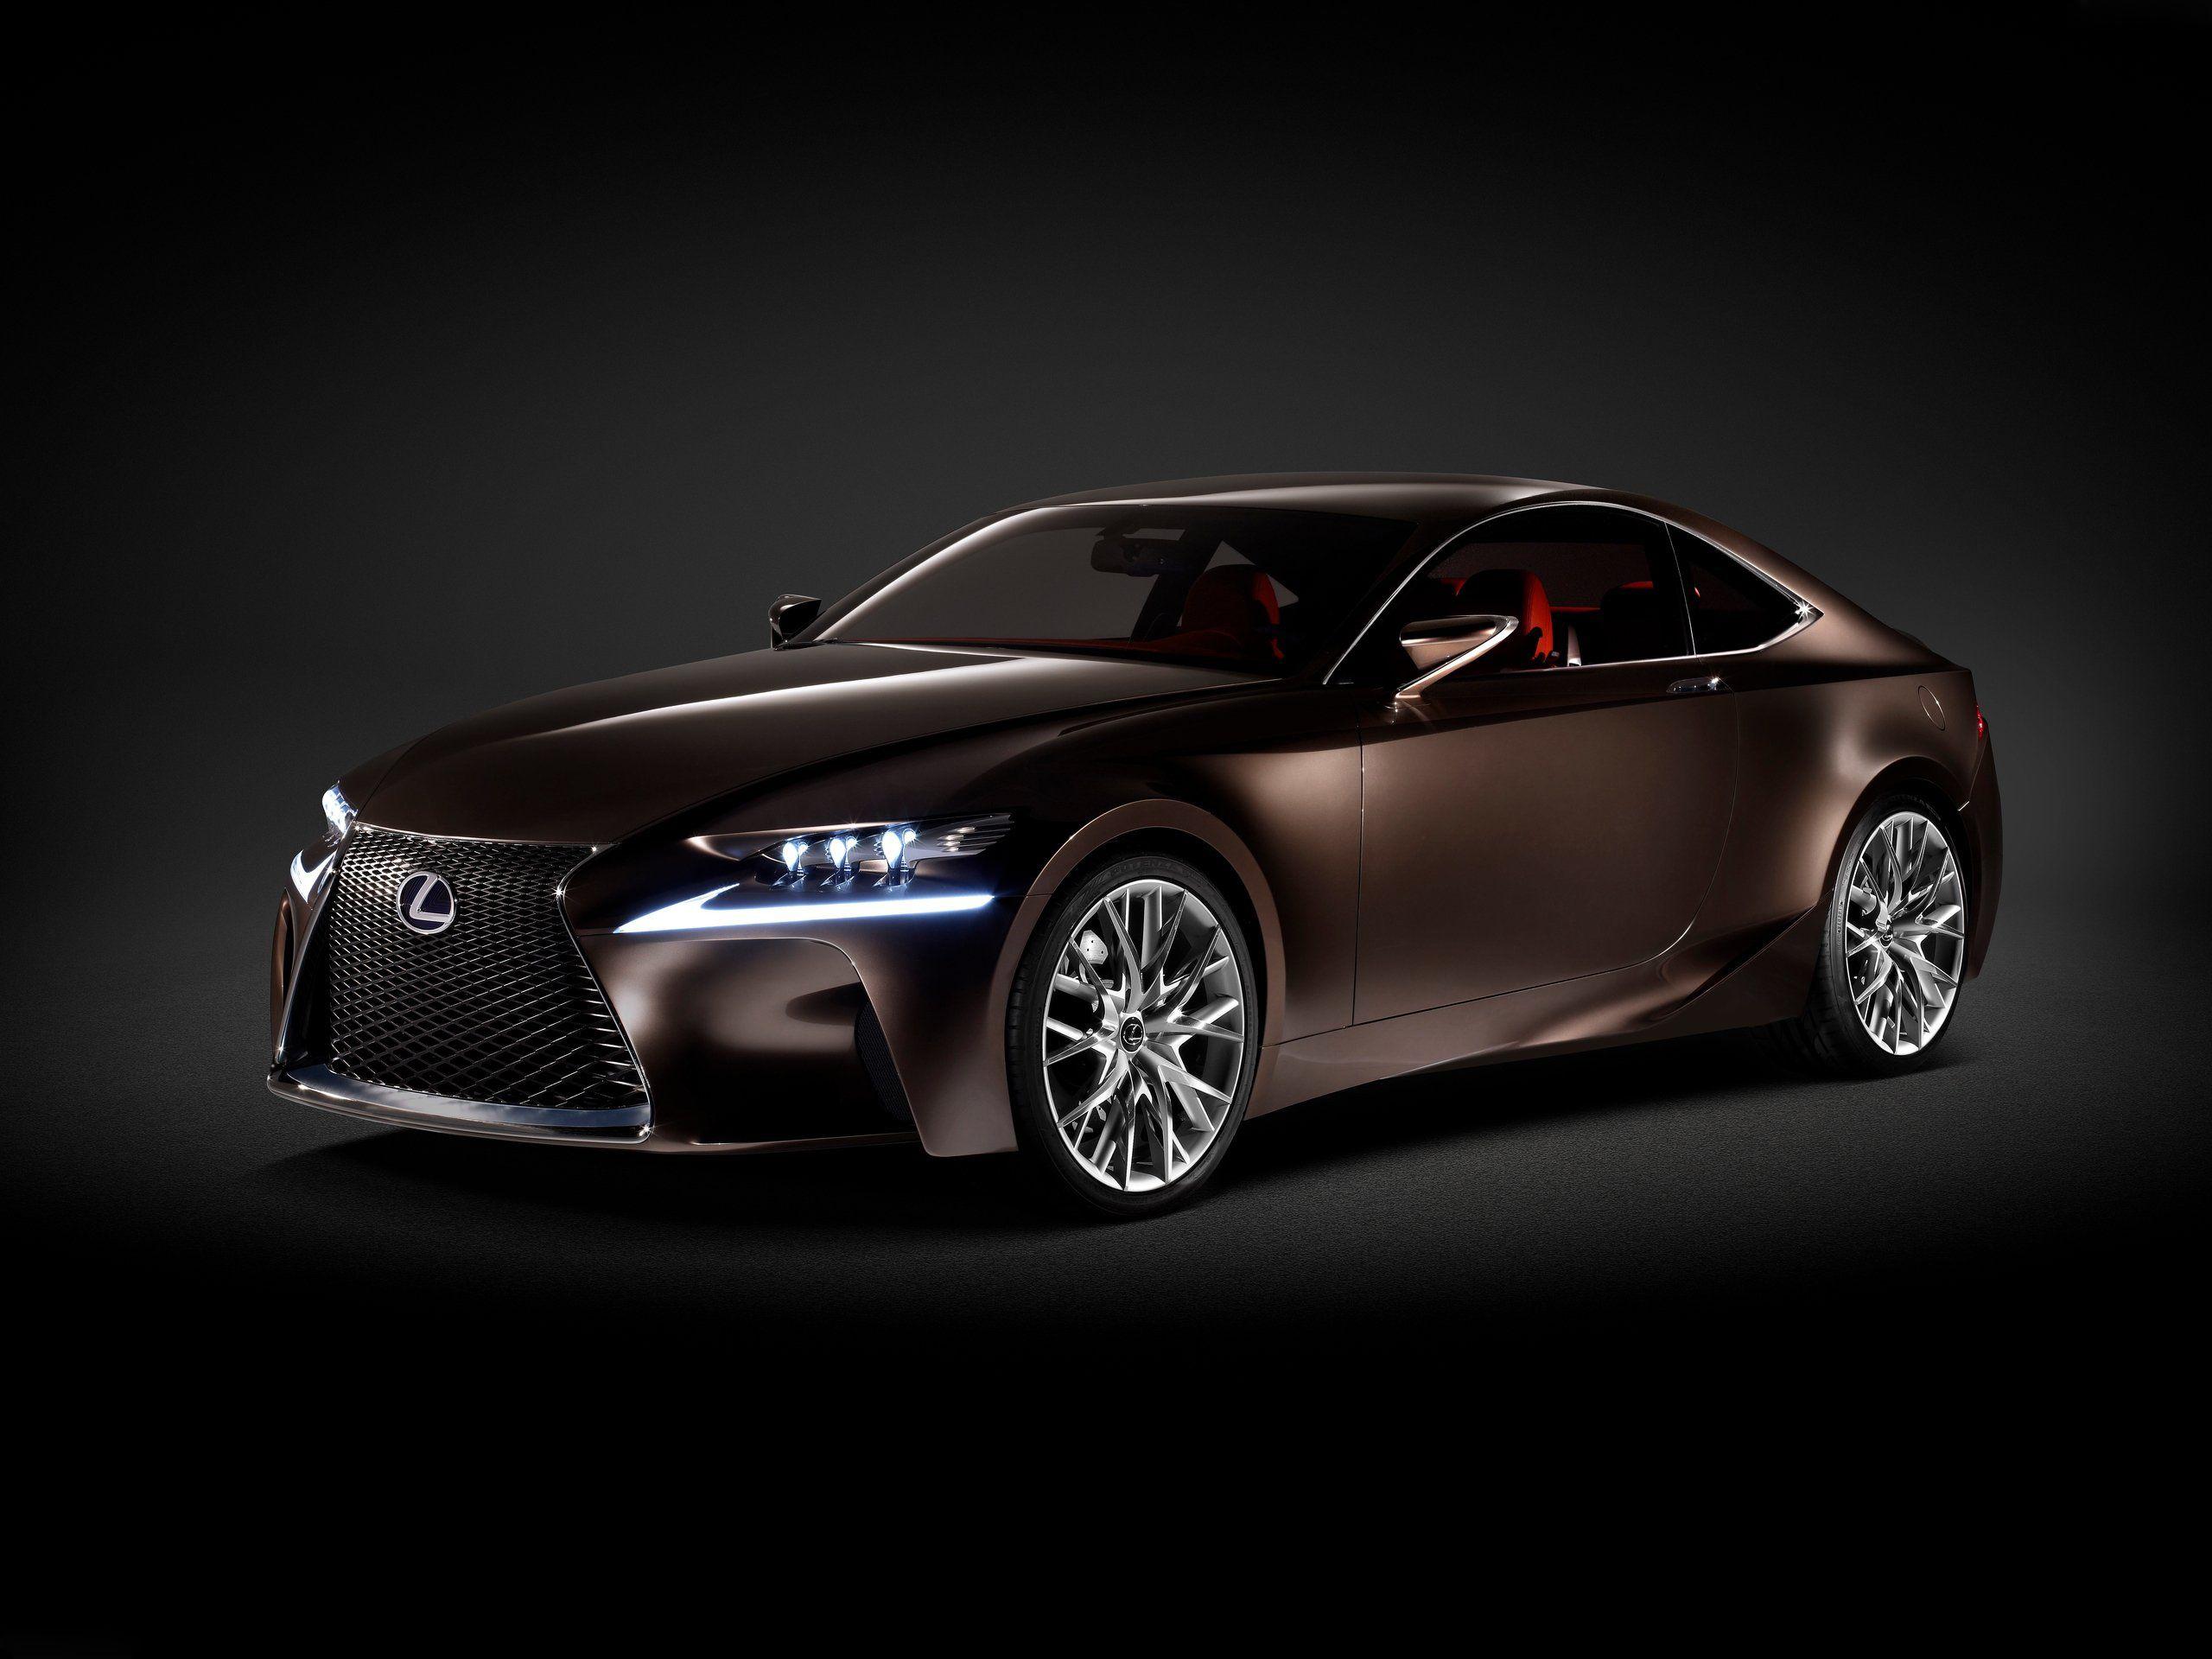 Lexus LFCC Concept 2012 HD Images and Photos Автомобили